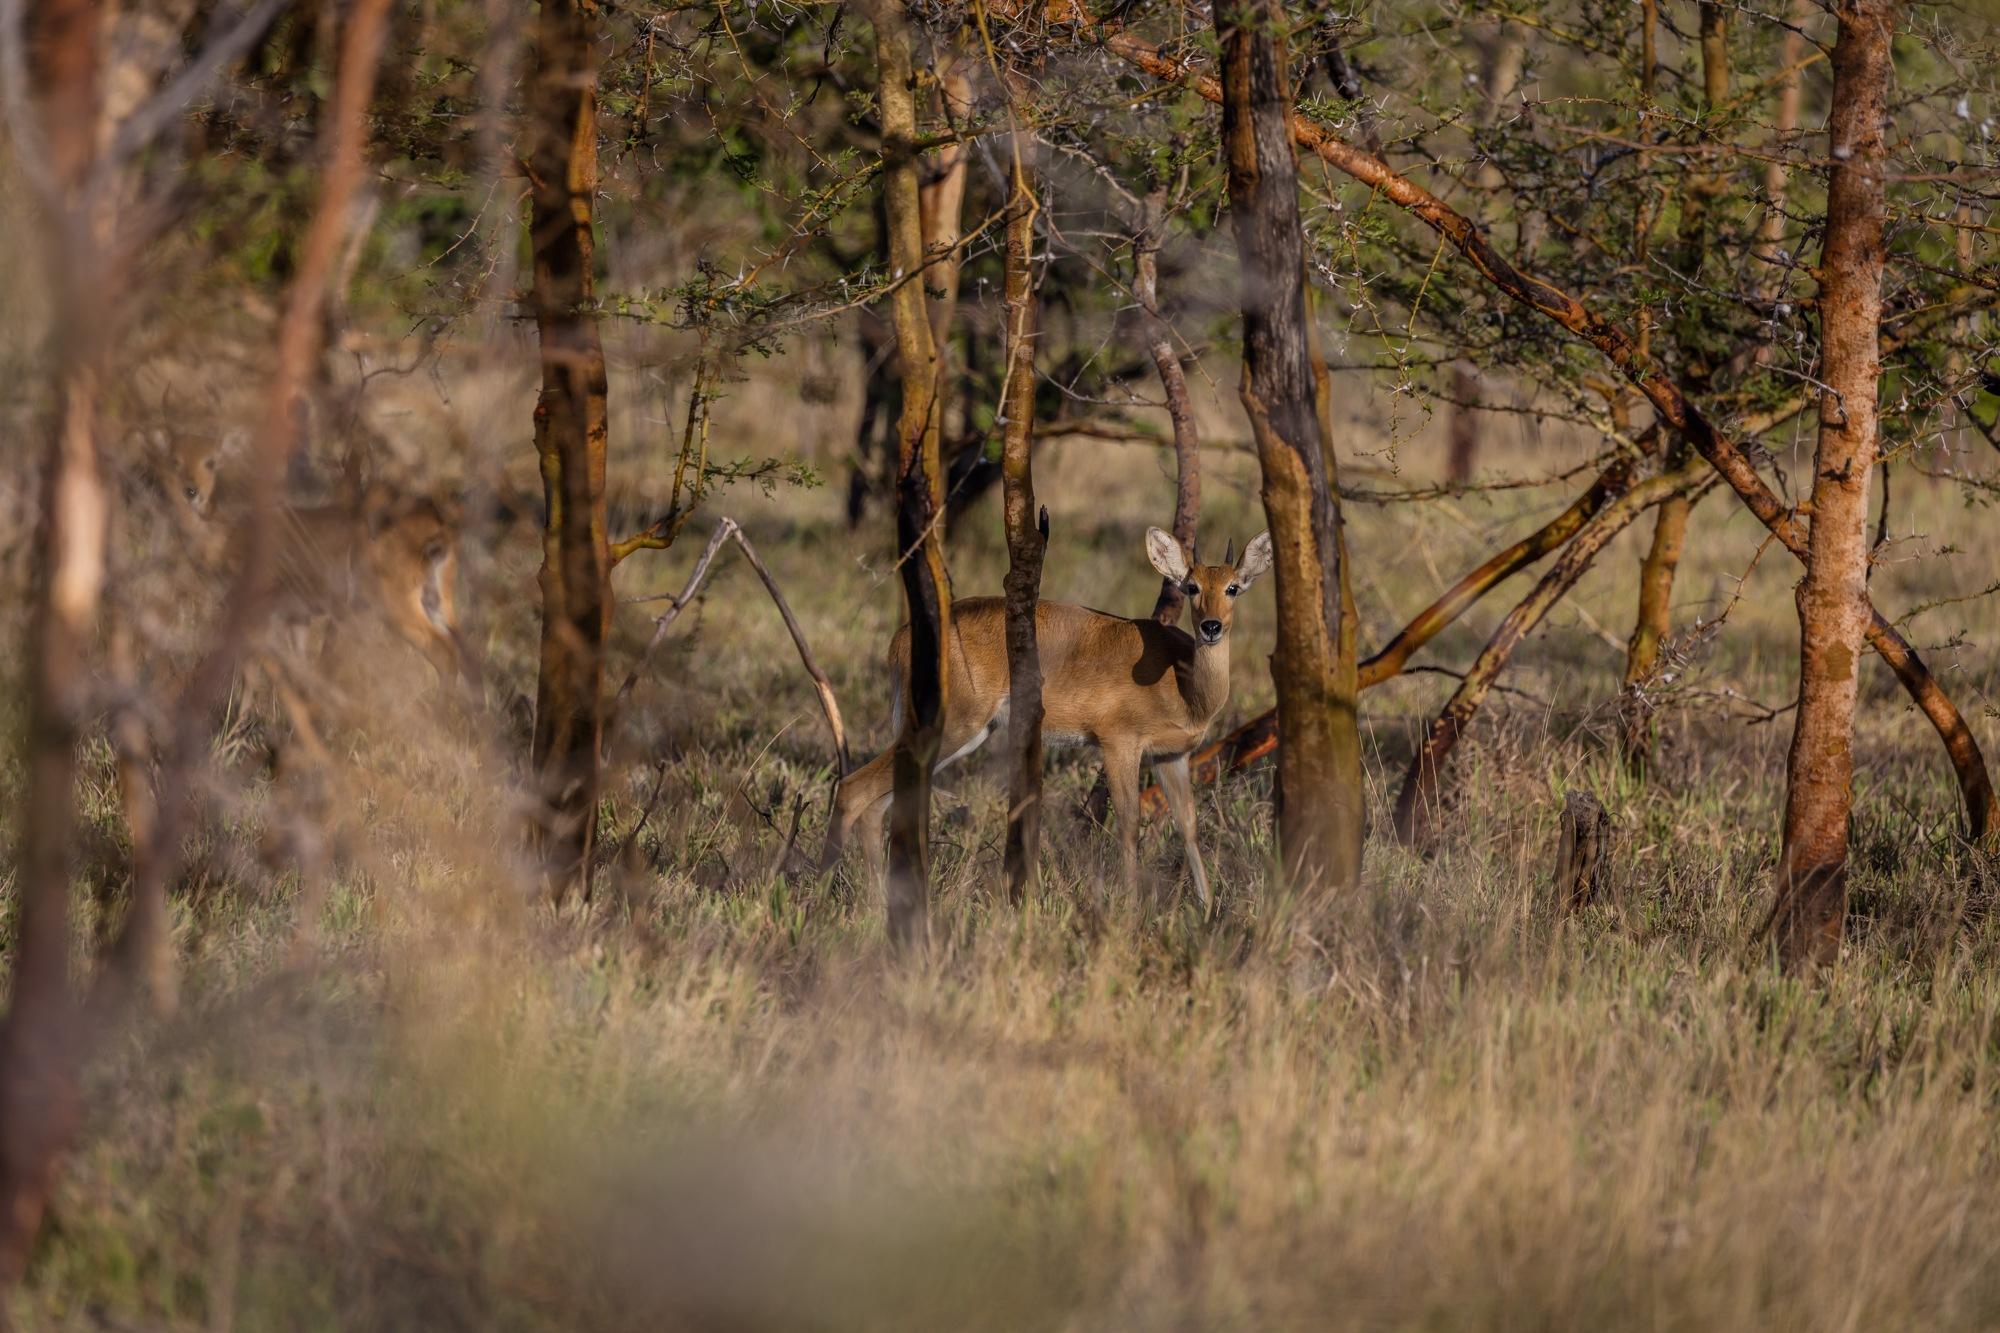 Deer of Saadani  by Mwinyi Bakari Mweri